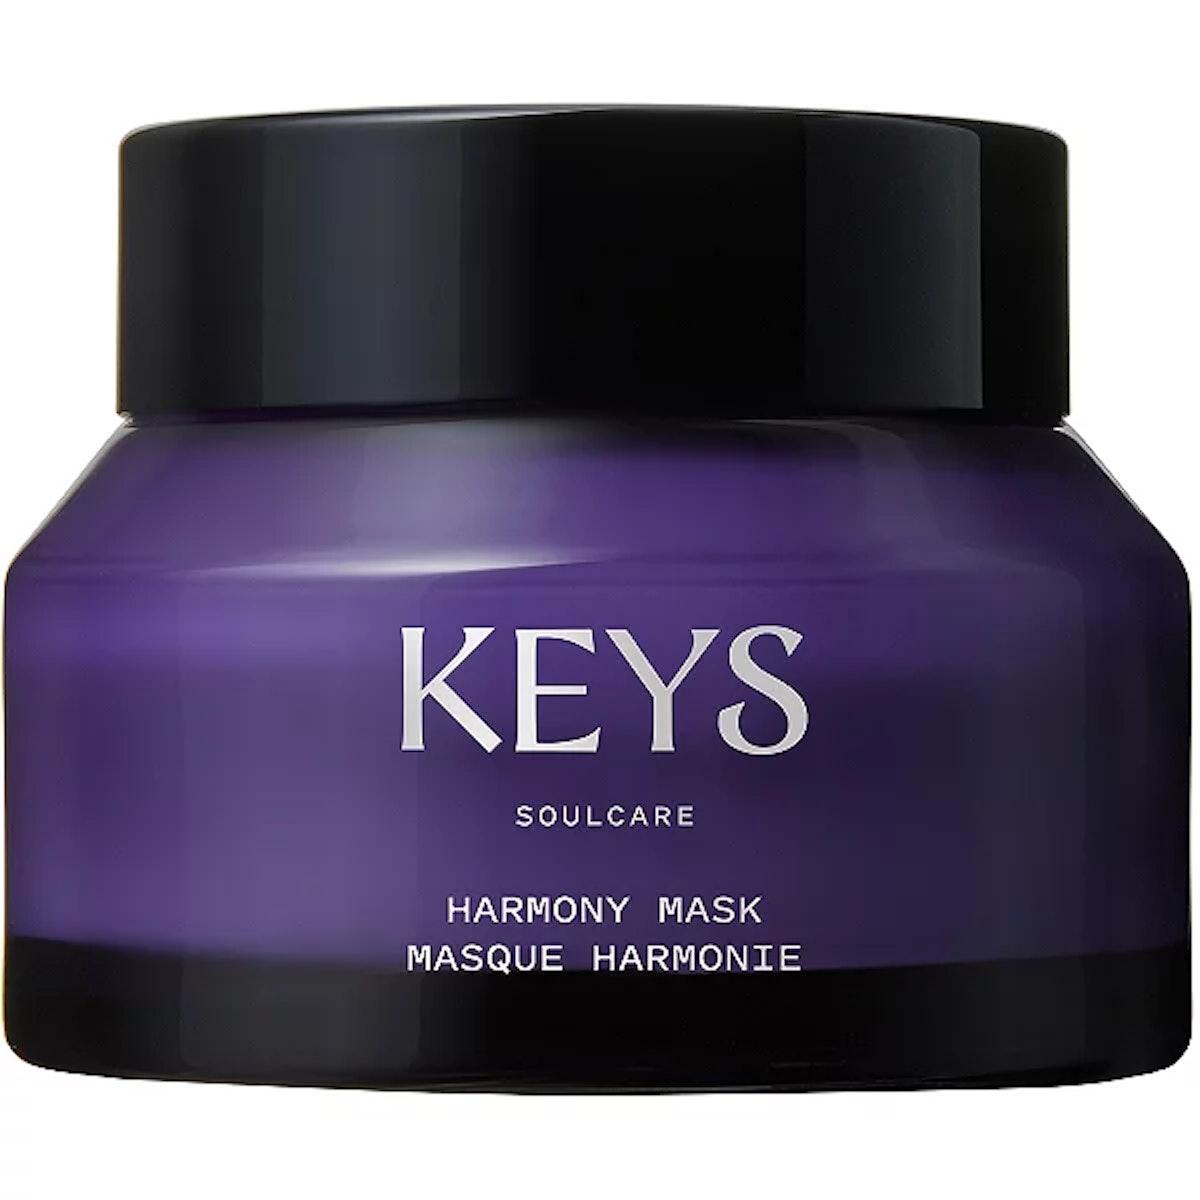 Keys Soulcare Harmony Mask